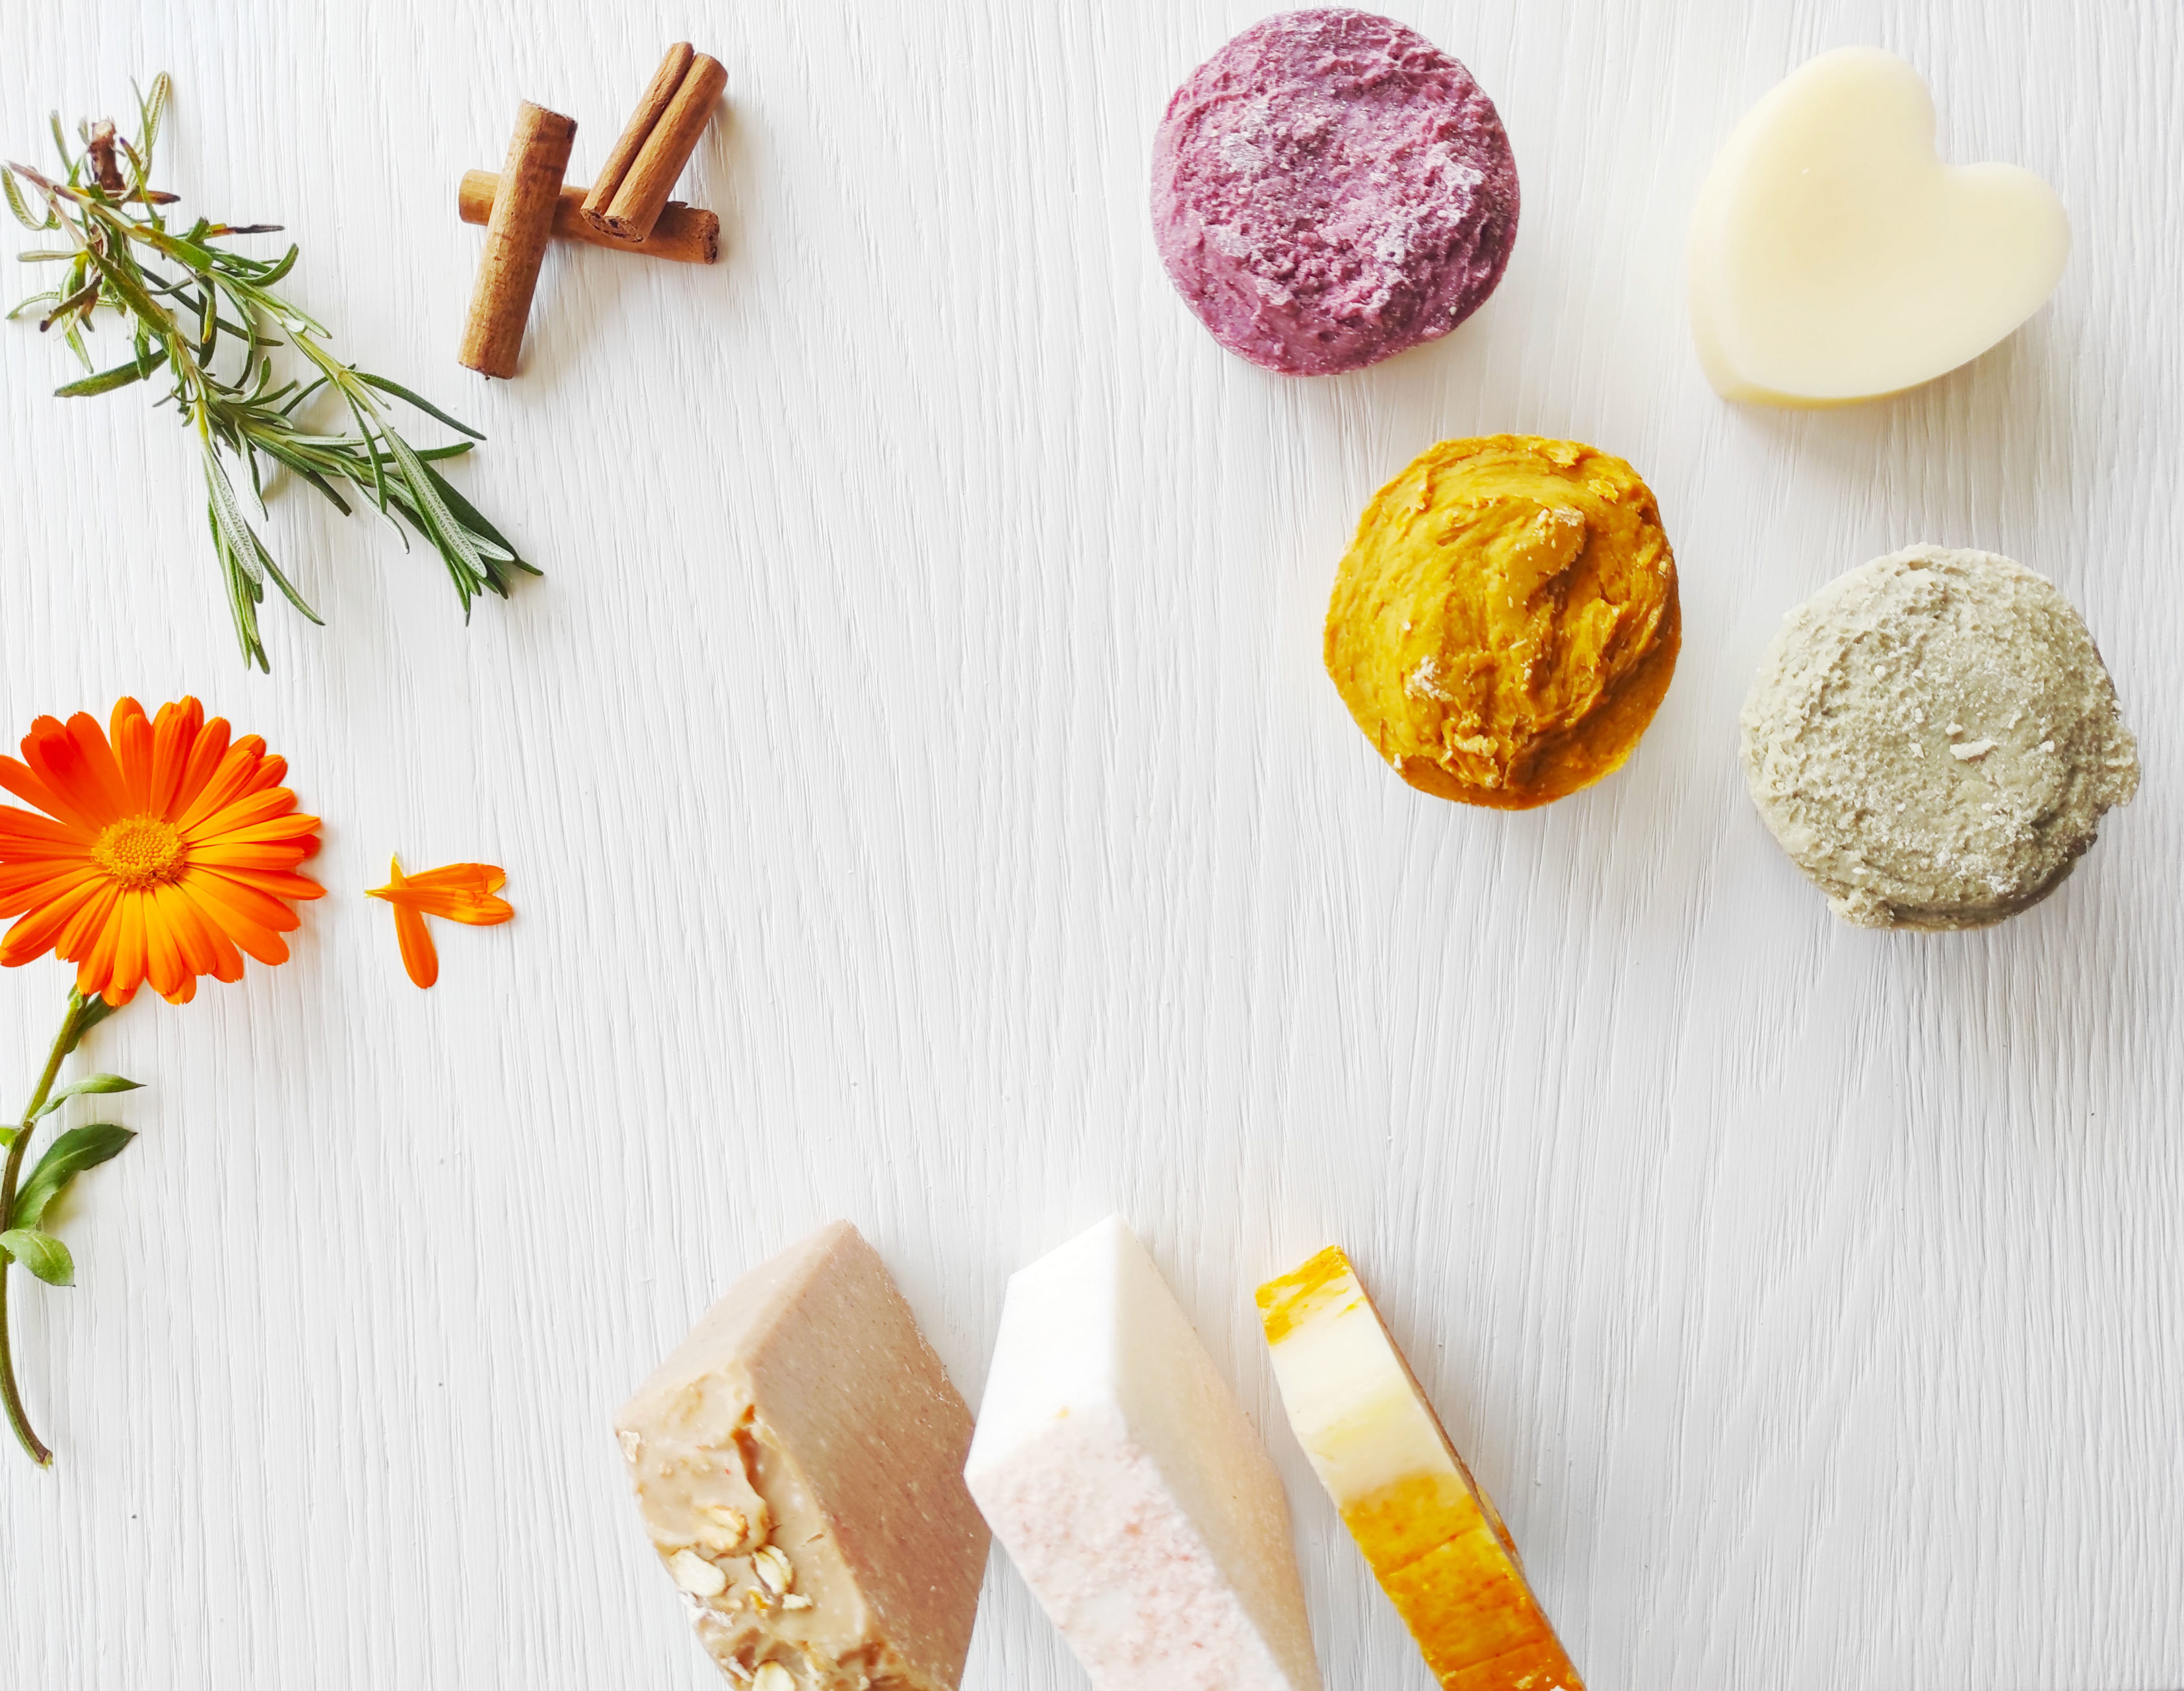 cosmetica-solida-naturale-artigianale-nivaria-canarias